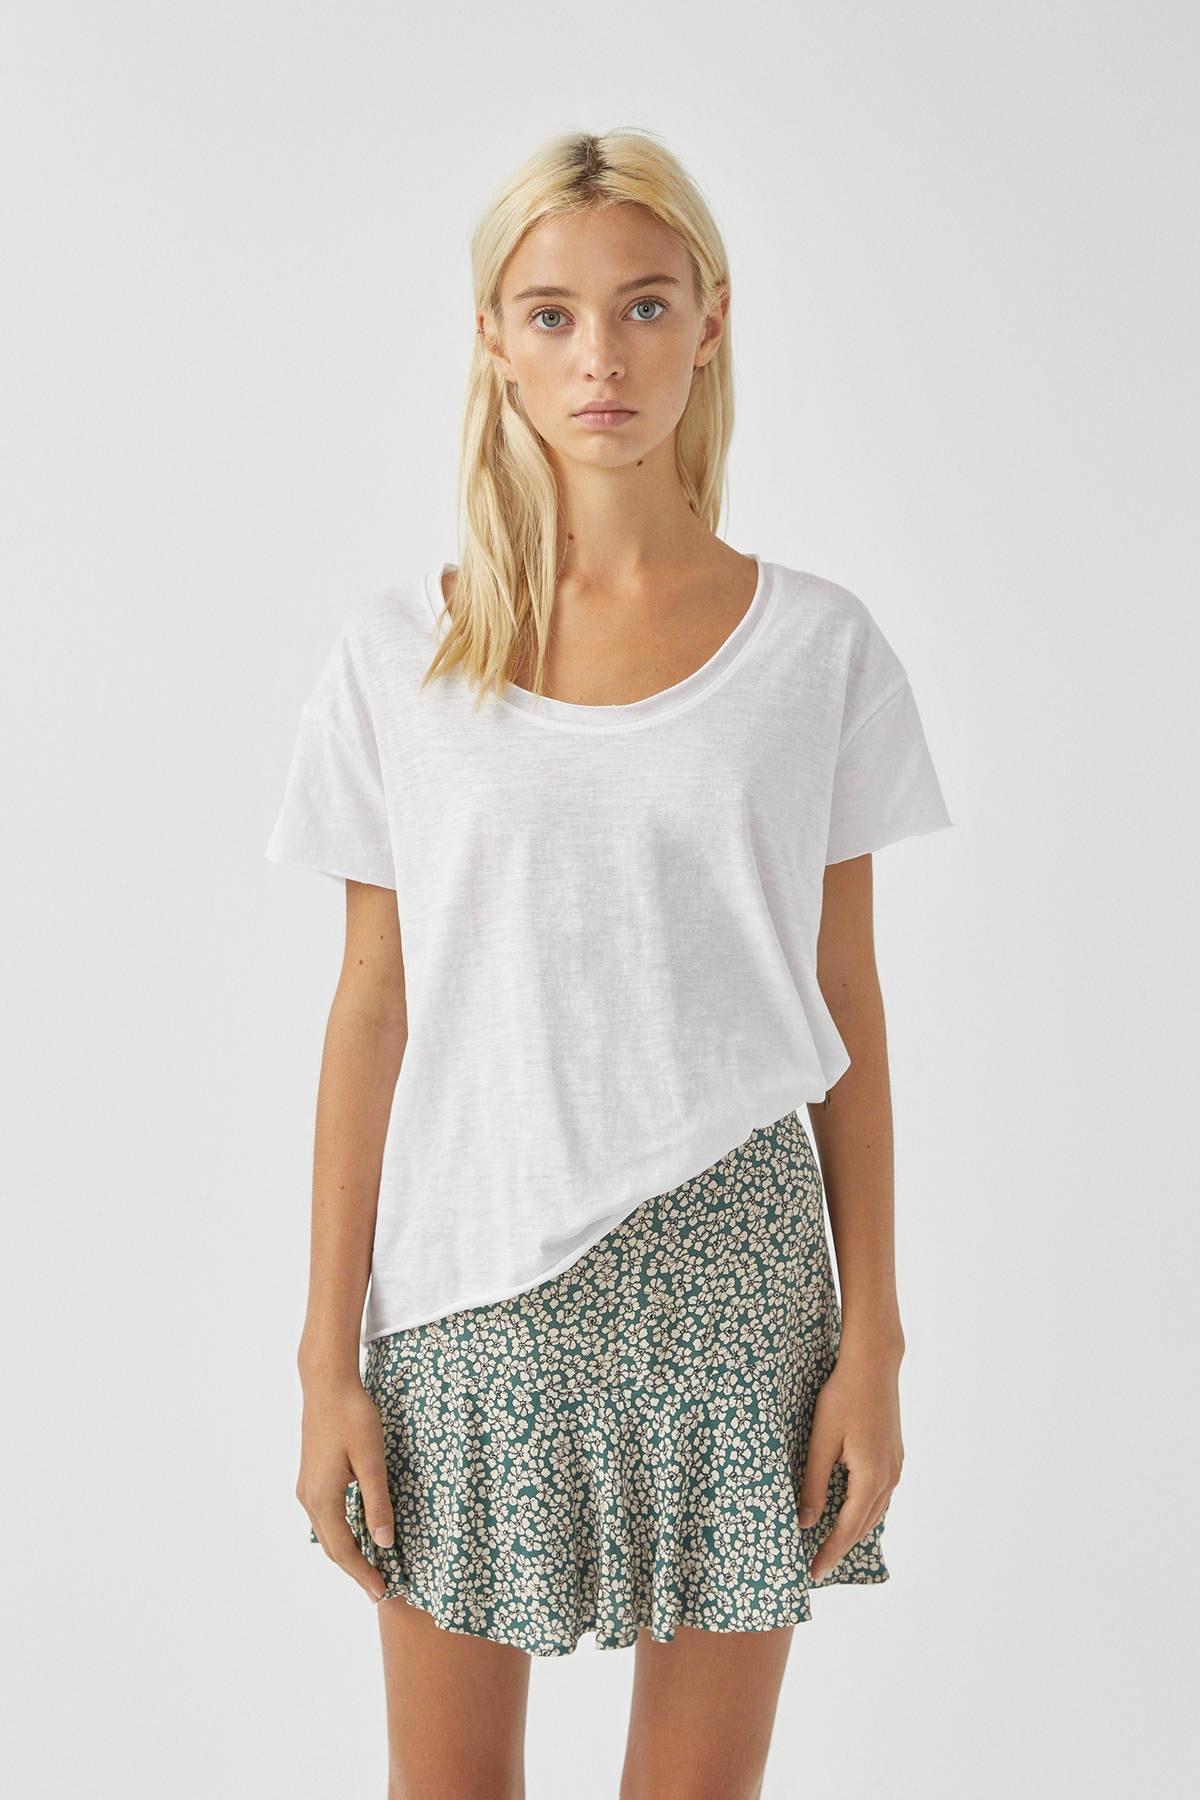 Pull & Bear Kadın Beyaz Biyeli Dikişli Basic T-Shirt 05236307